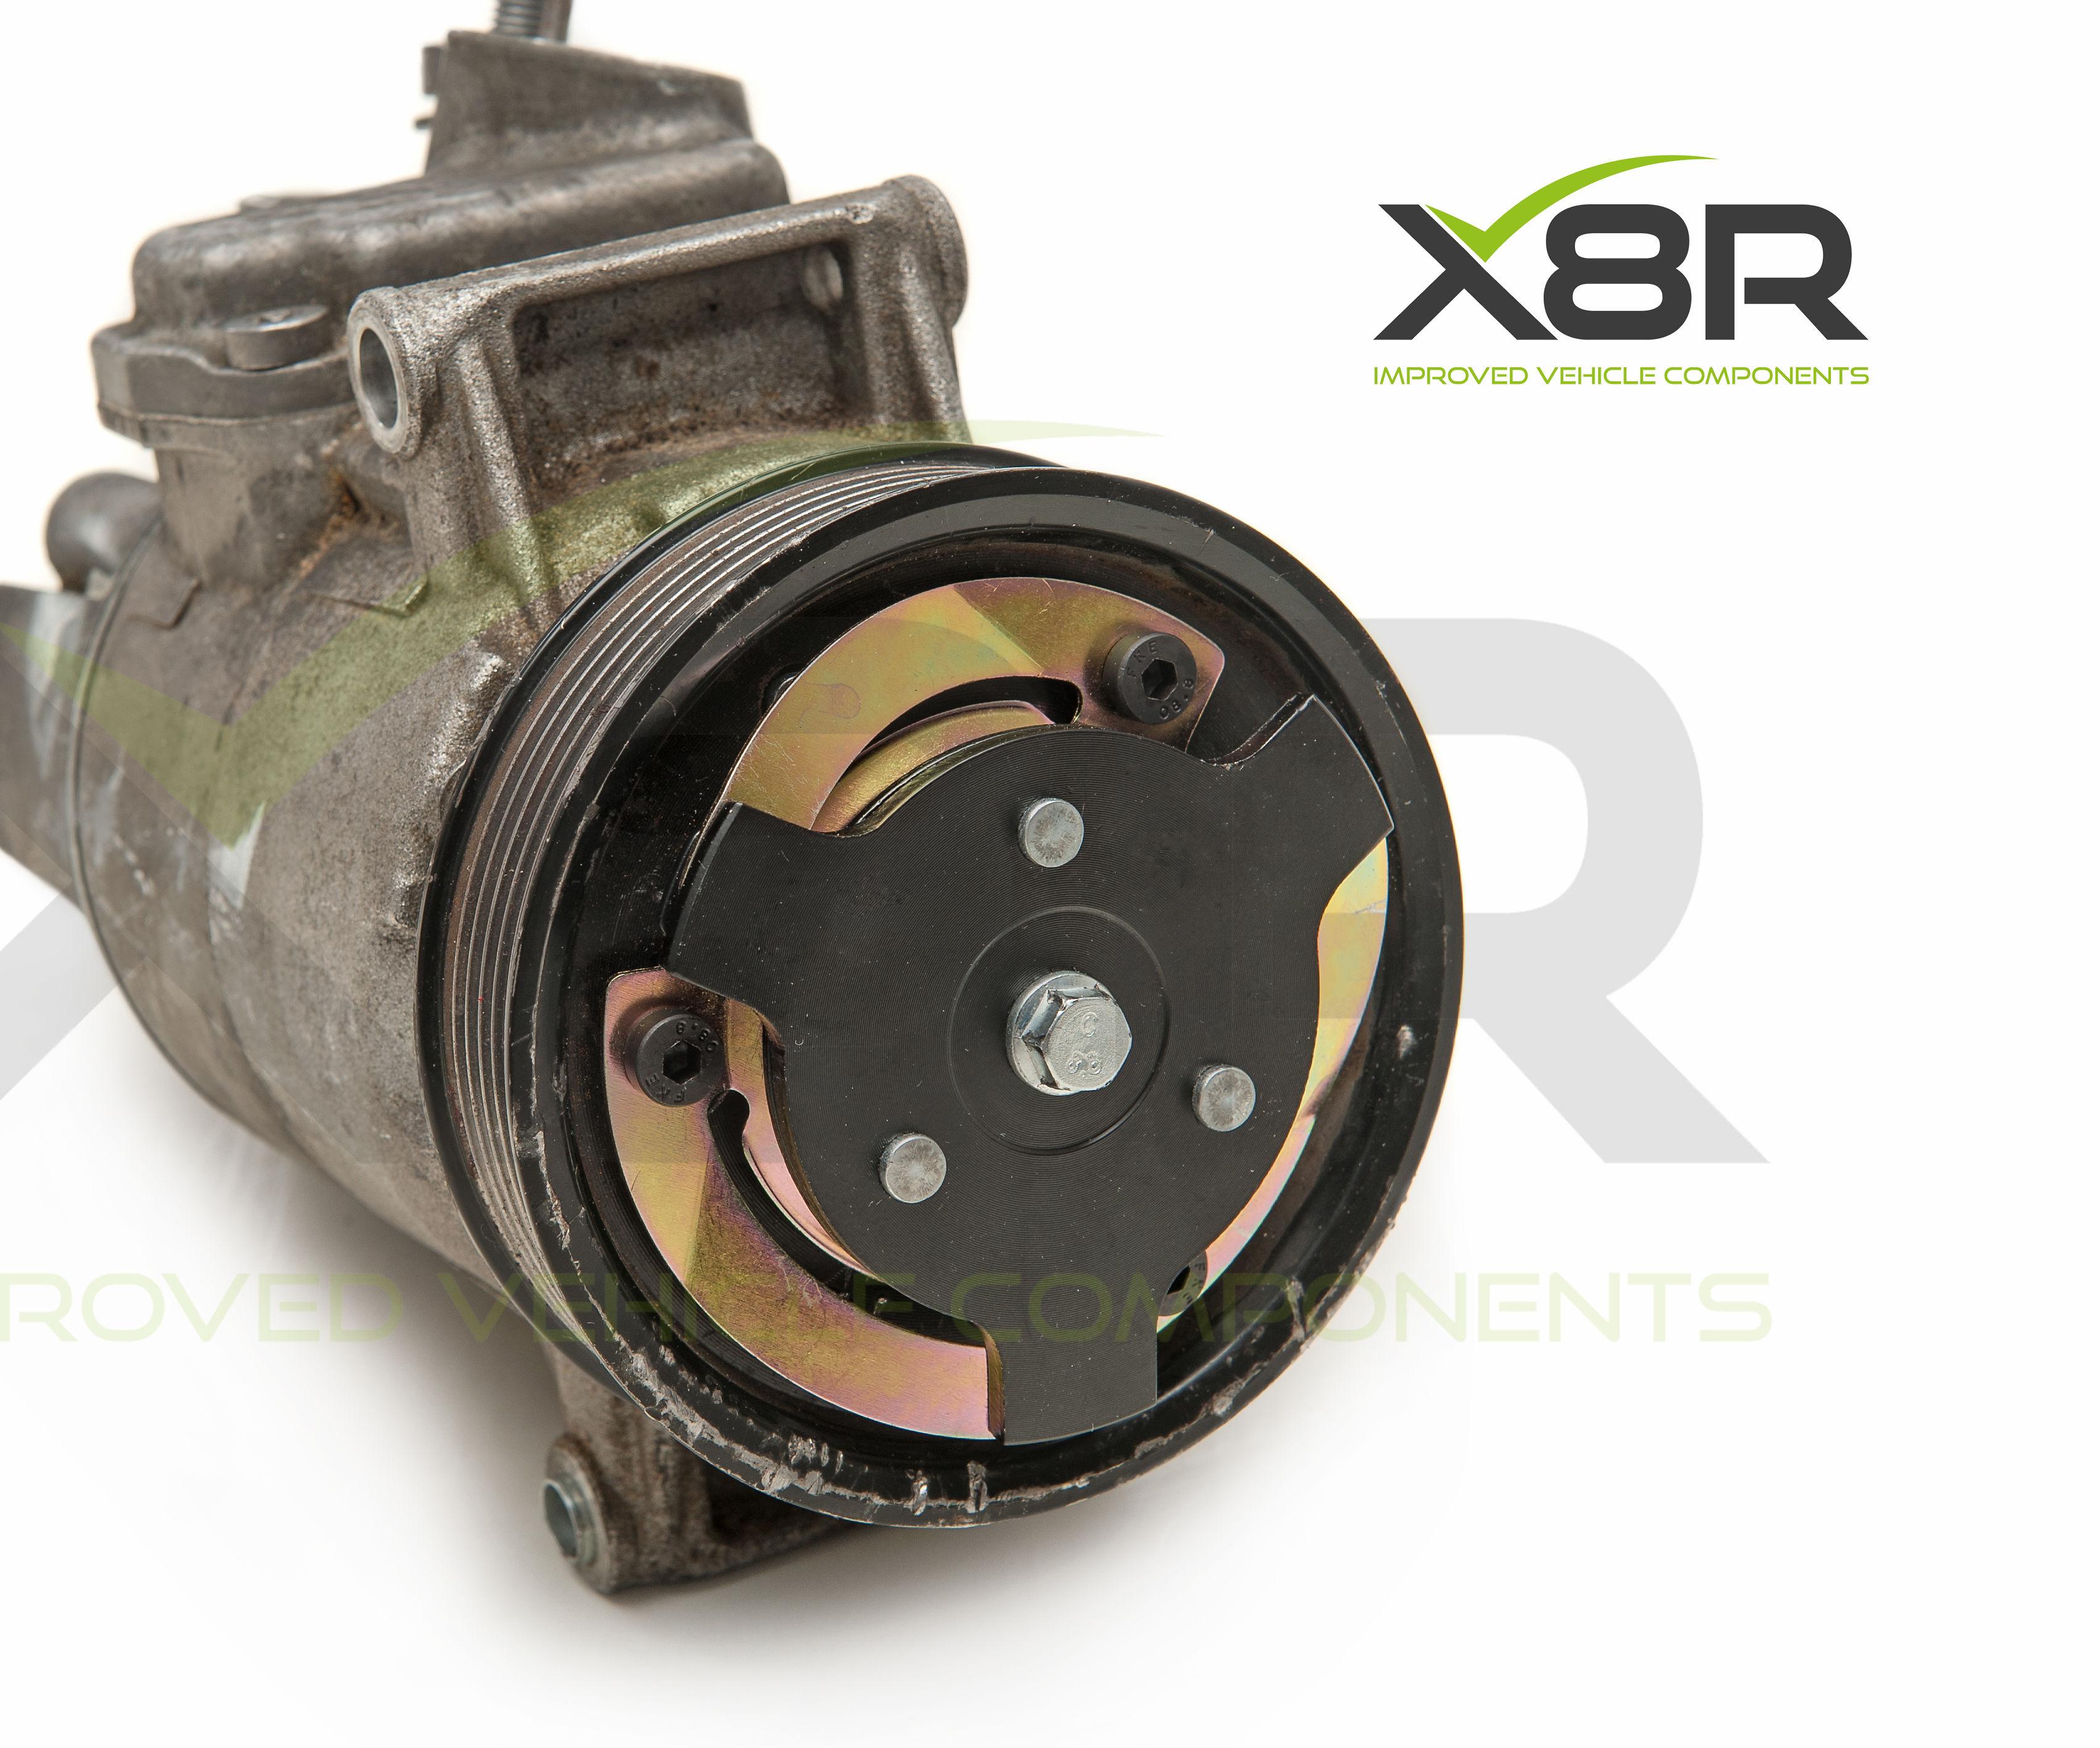 VW Audi Seat Skoda Air Conditioning Compressor Pump Clutch Hub Plate Disc 5N0820803, 5N0820803A, 5N0820803E, 5K0820803A Repair Fix Kit Instructions Install Guide